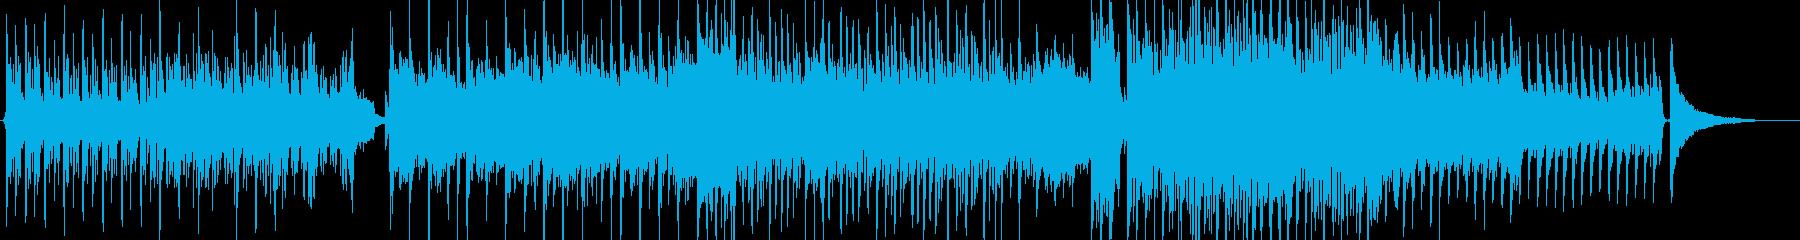 PV幸せな場面EDウェディング・Xmasの再生済みの波形